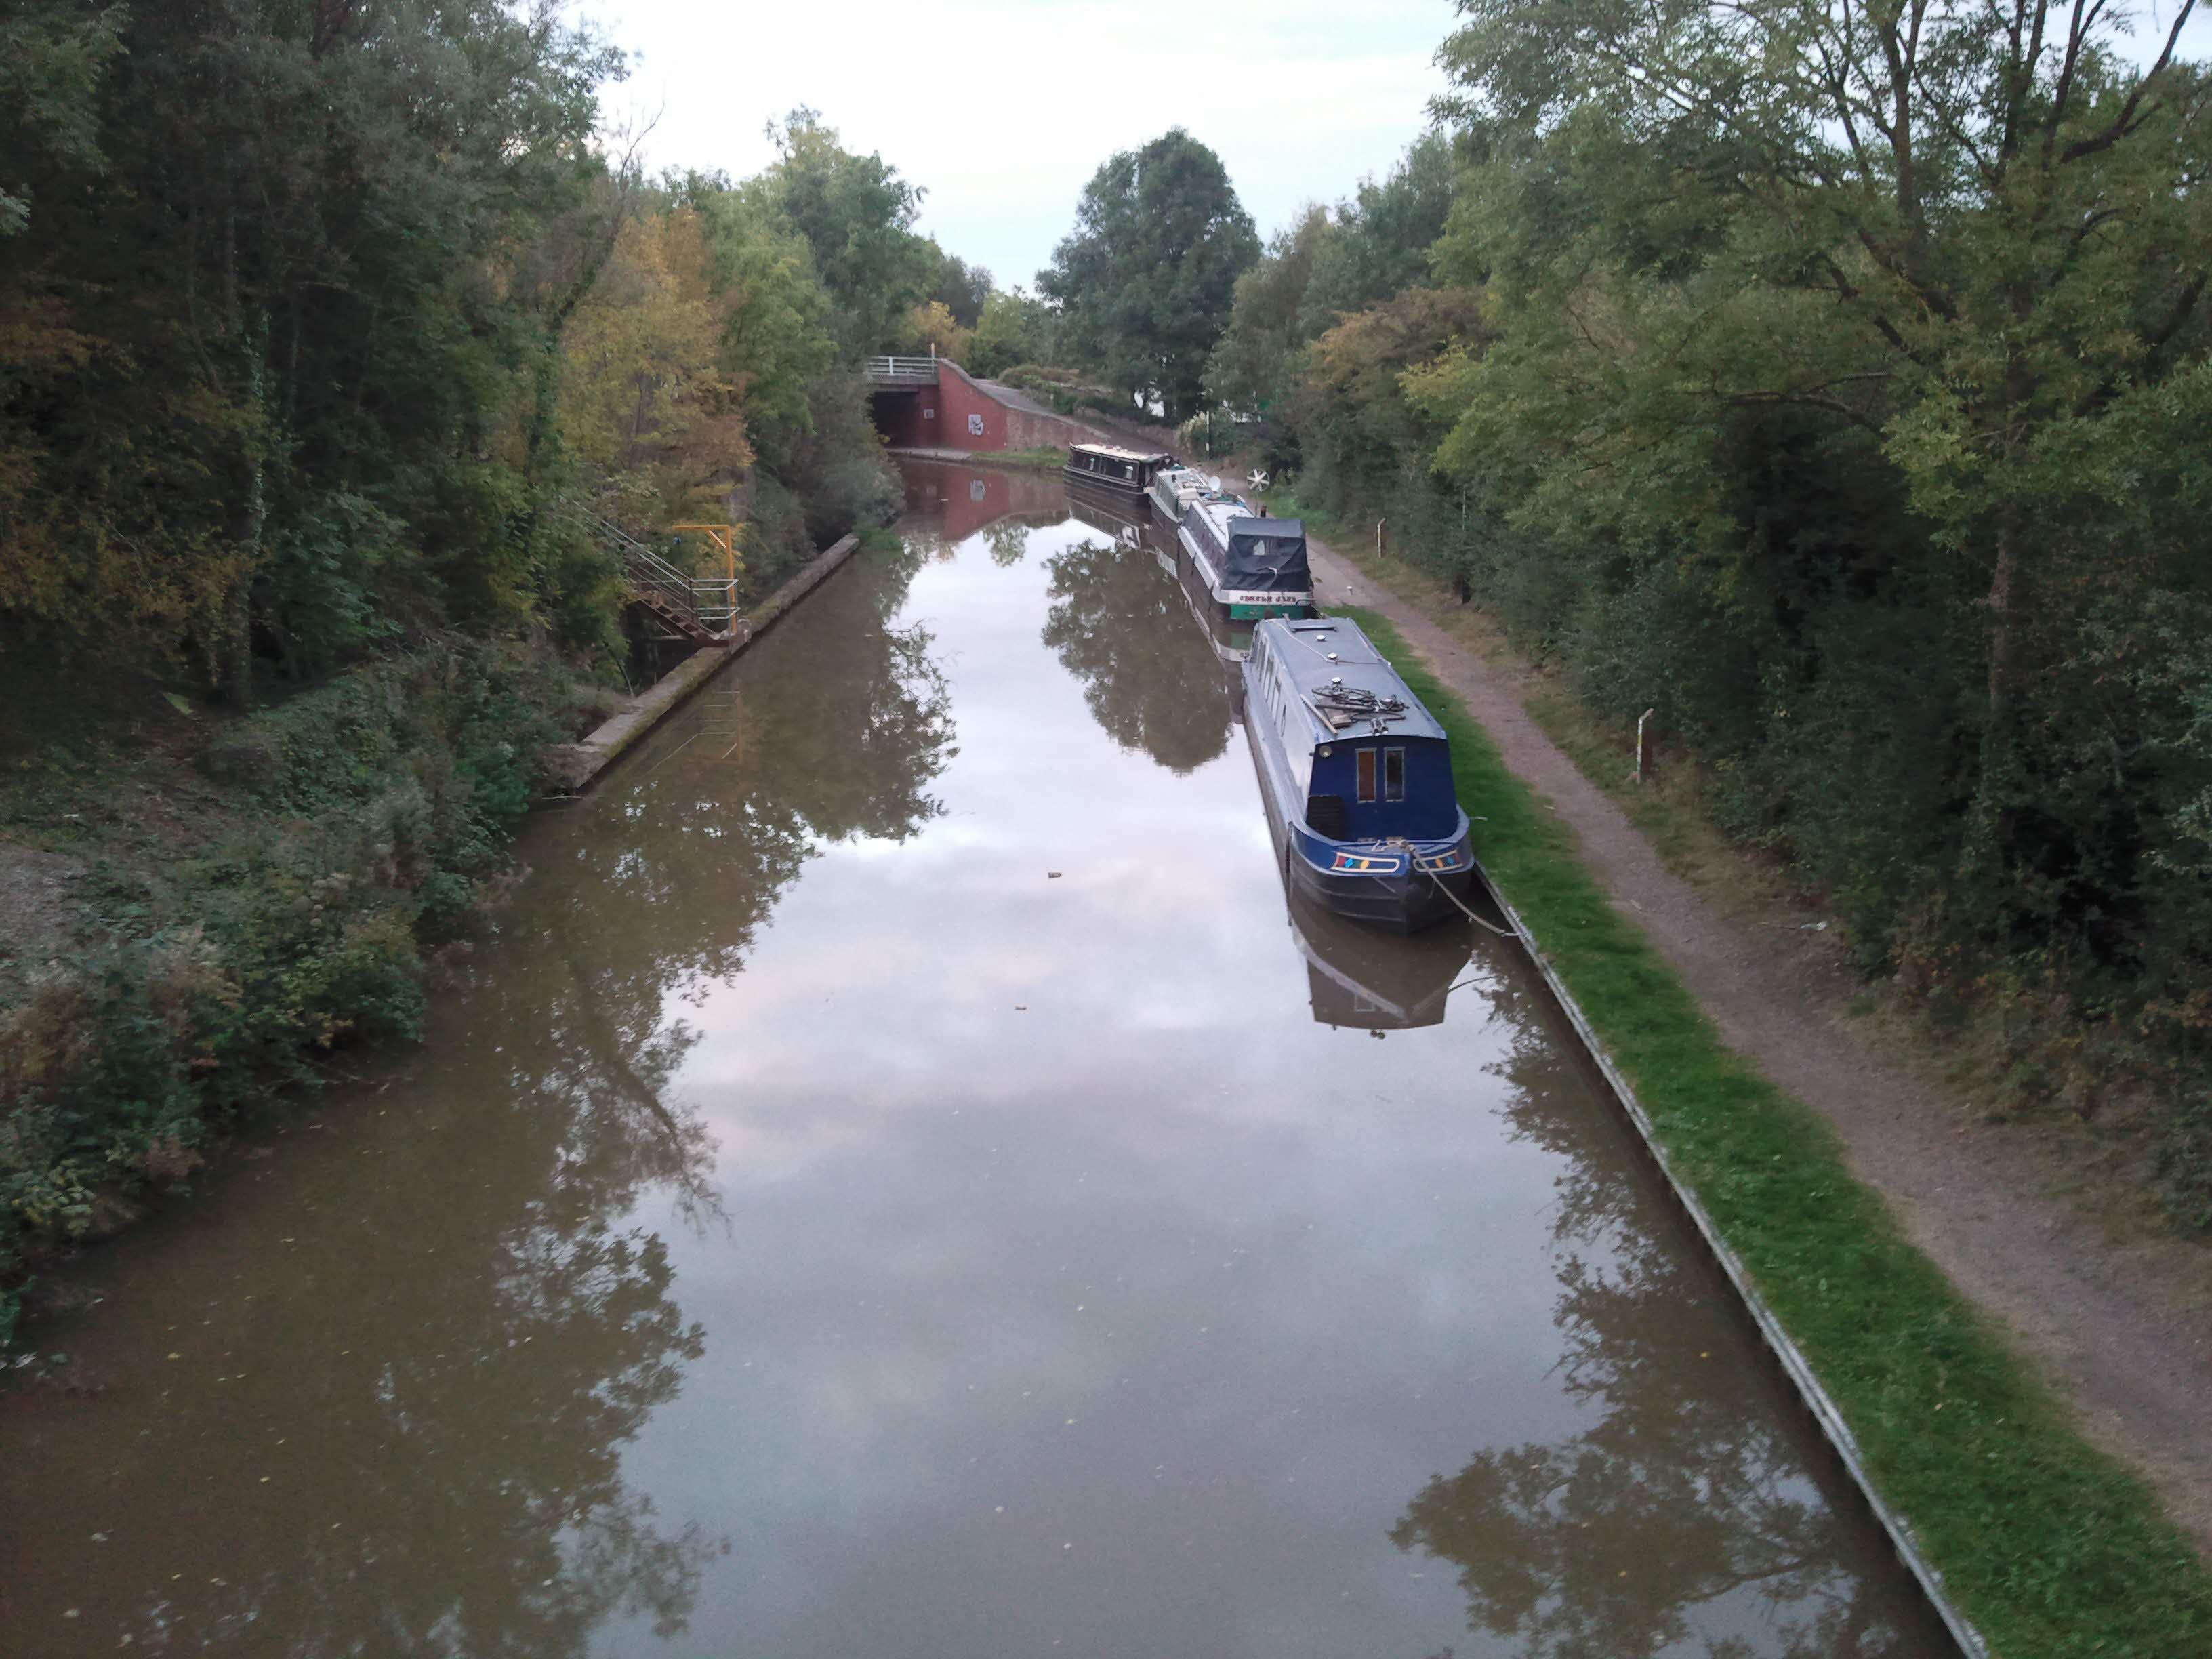 The moorings at Bridge 29 - secure and welcoming...